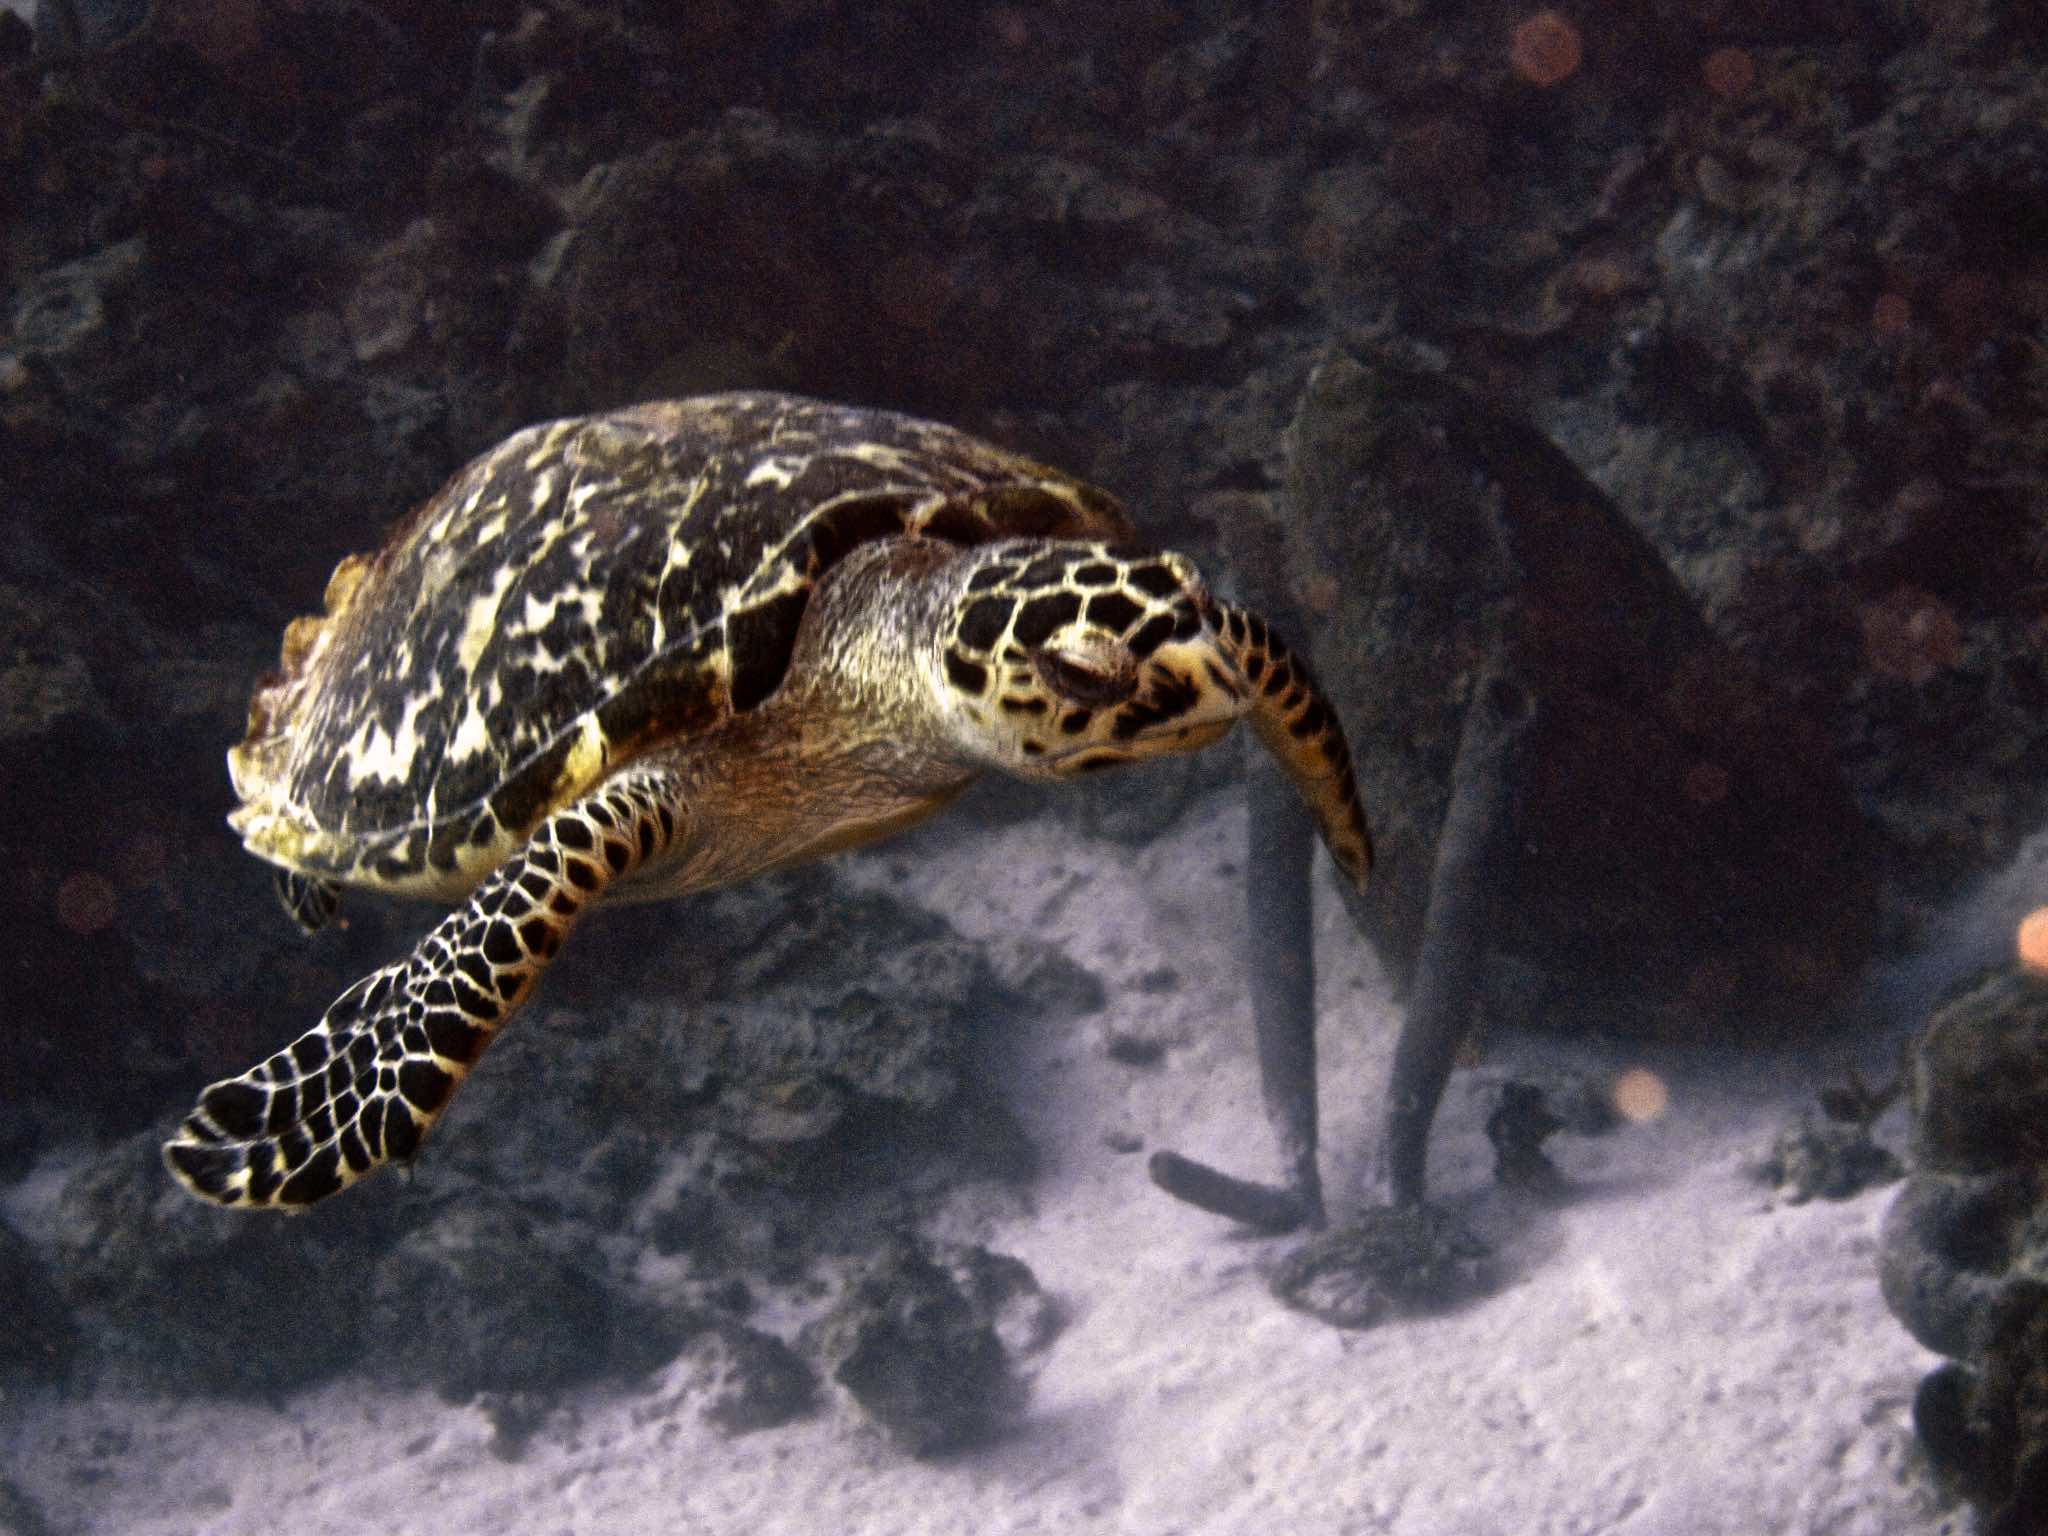 Turtle at Cali's Reef